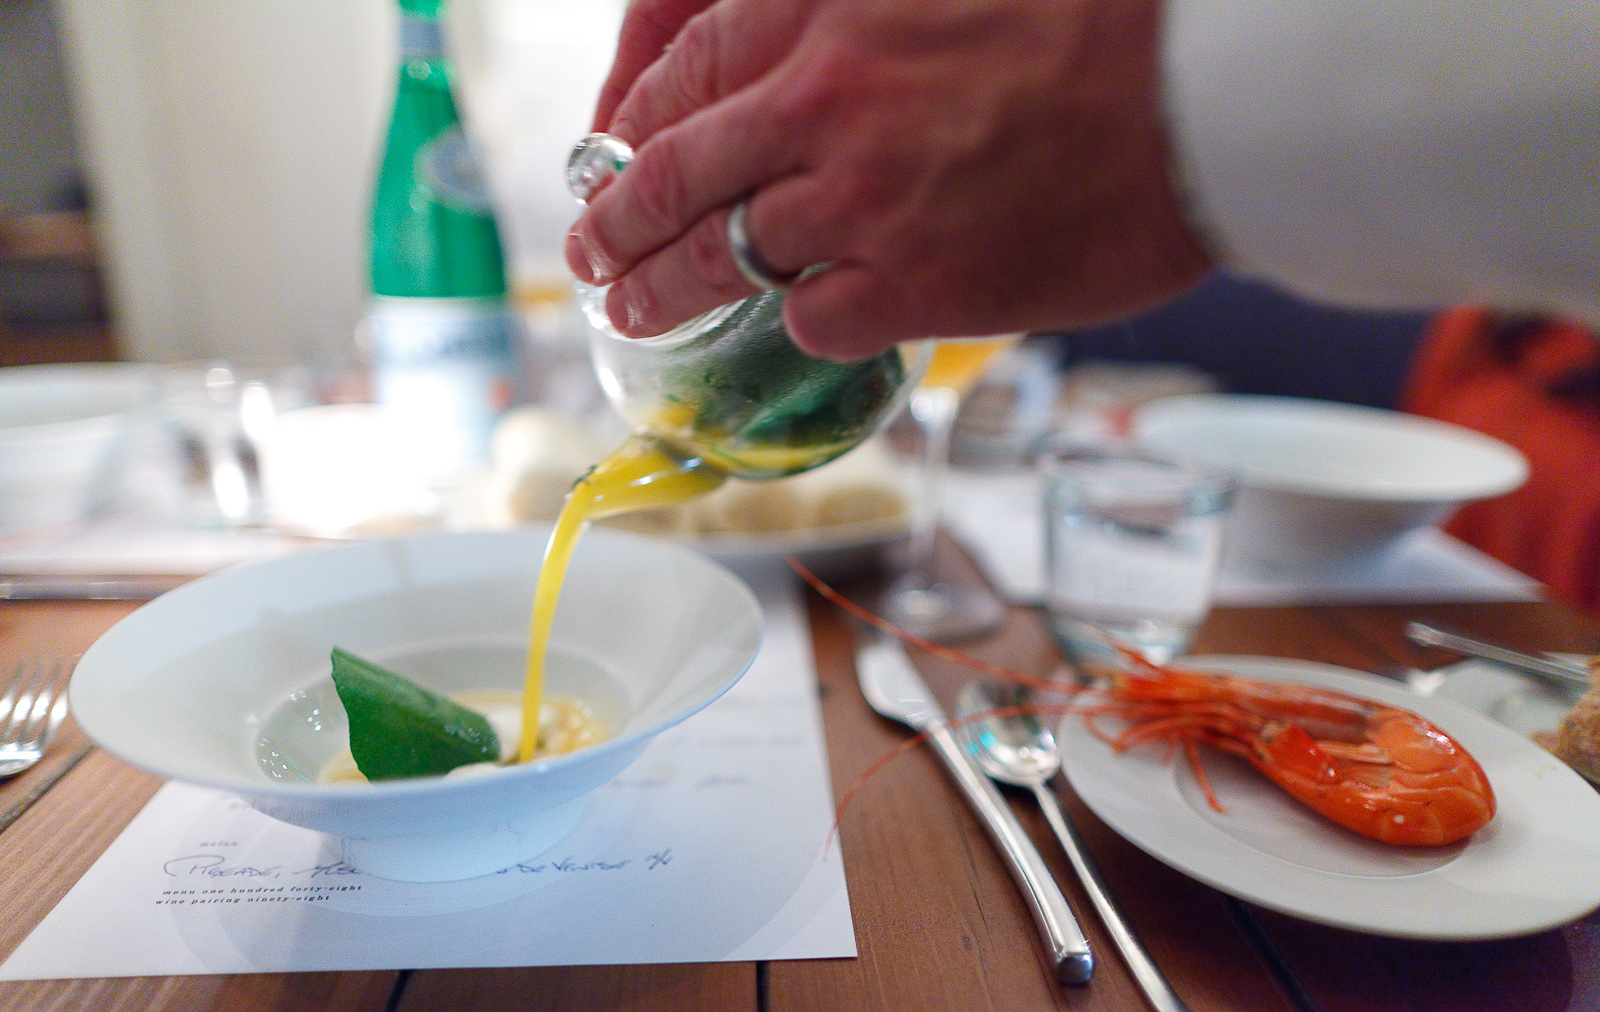 4th Course: Crustacean - Dungeness ragôut gently warmed in crustacean butter. Santa barbara sea urchin, wild nasturtium leaf roasted over the fire until crisp. Crustacean bouillion of lobste